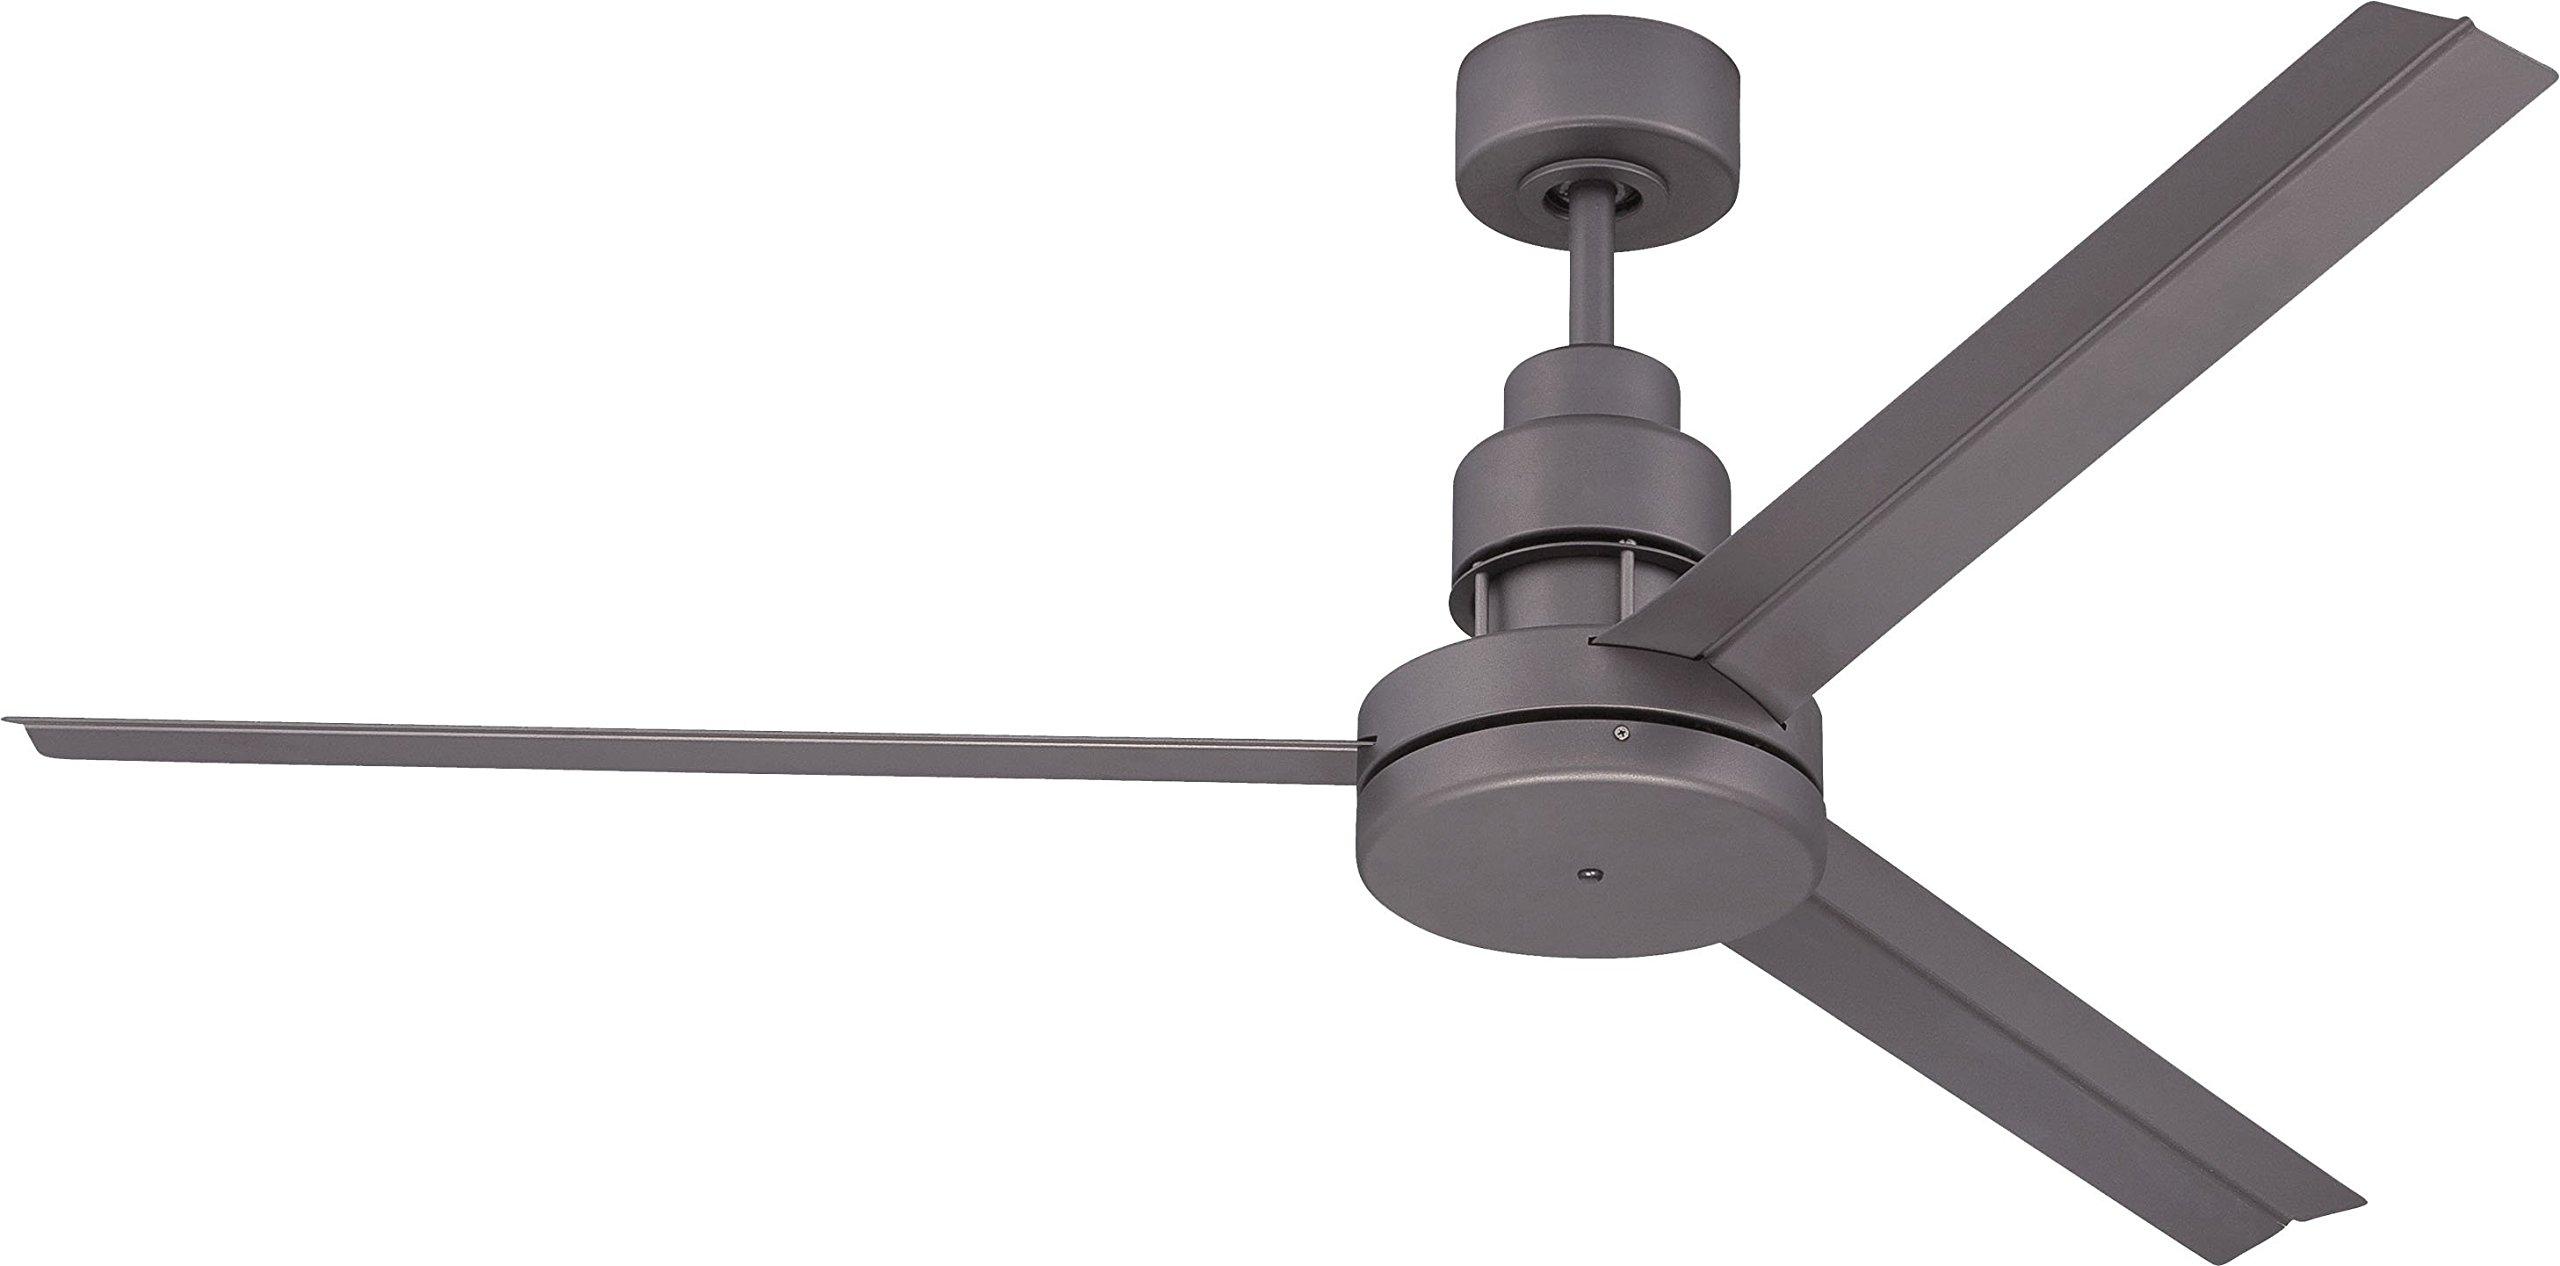 Craftmade MND54ESP3 Mondo Espresso 54 inch 3 Blade Aluminum Outdoor Ceiling Fan With Remote